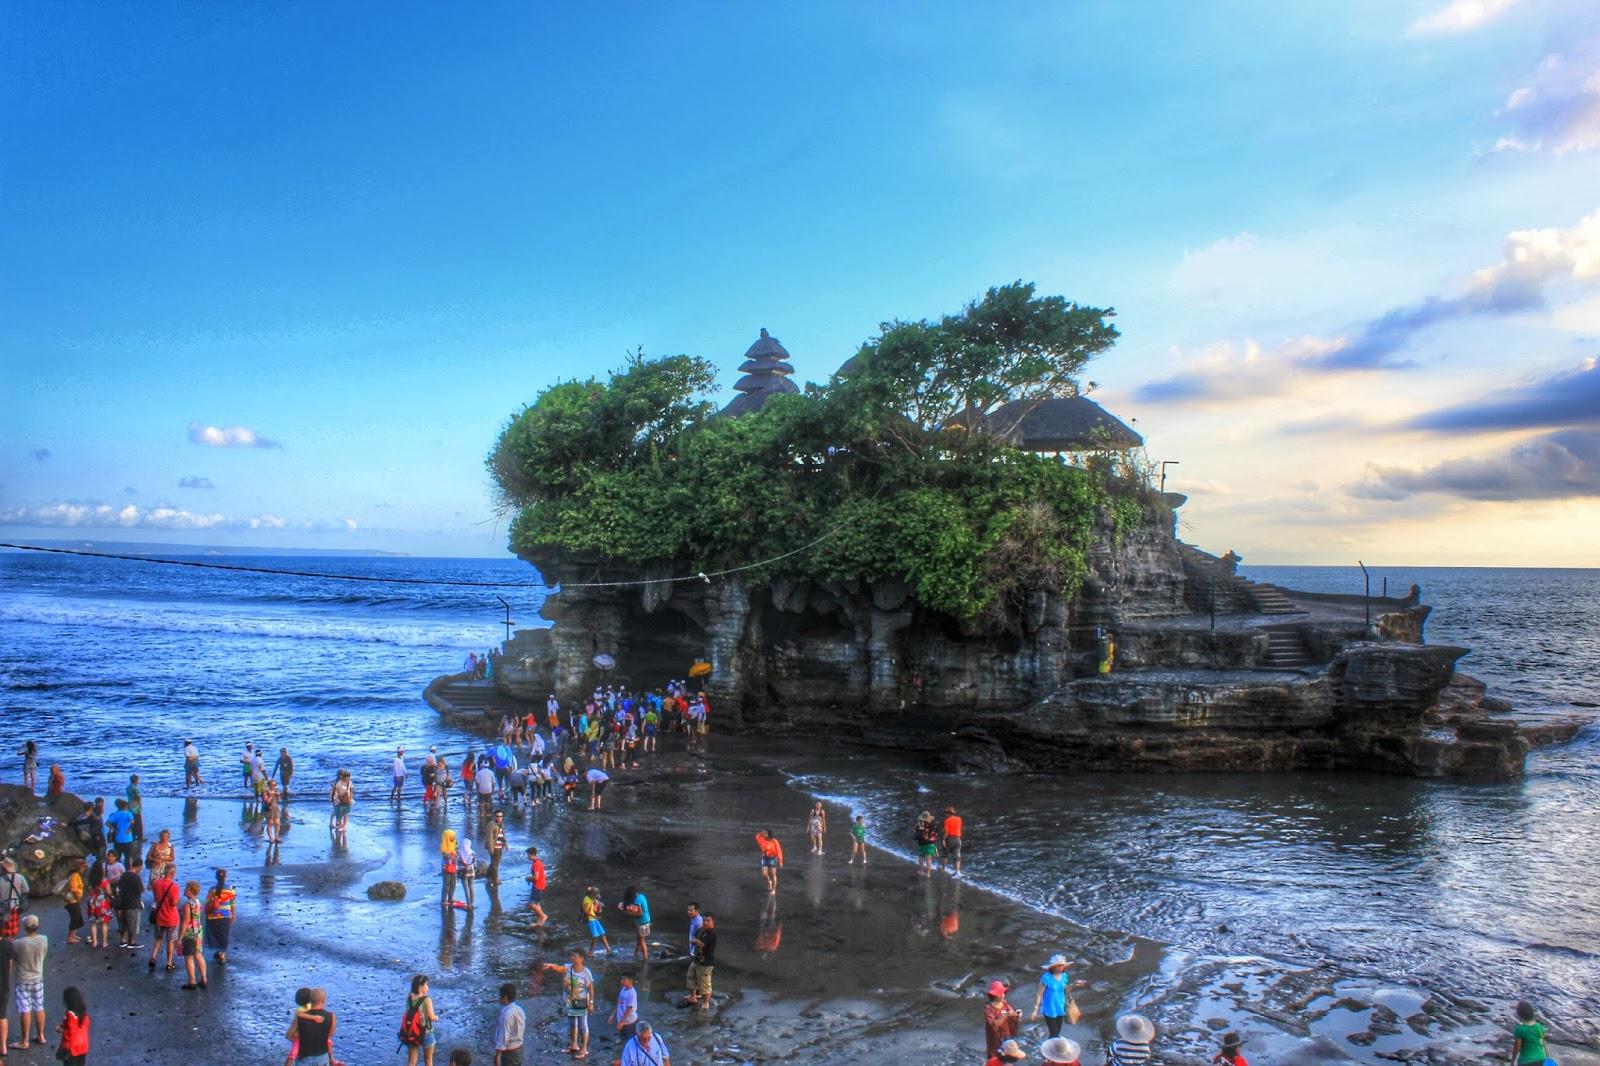 Tempat wisata di Bali Pura Tanah Lot